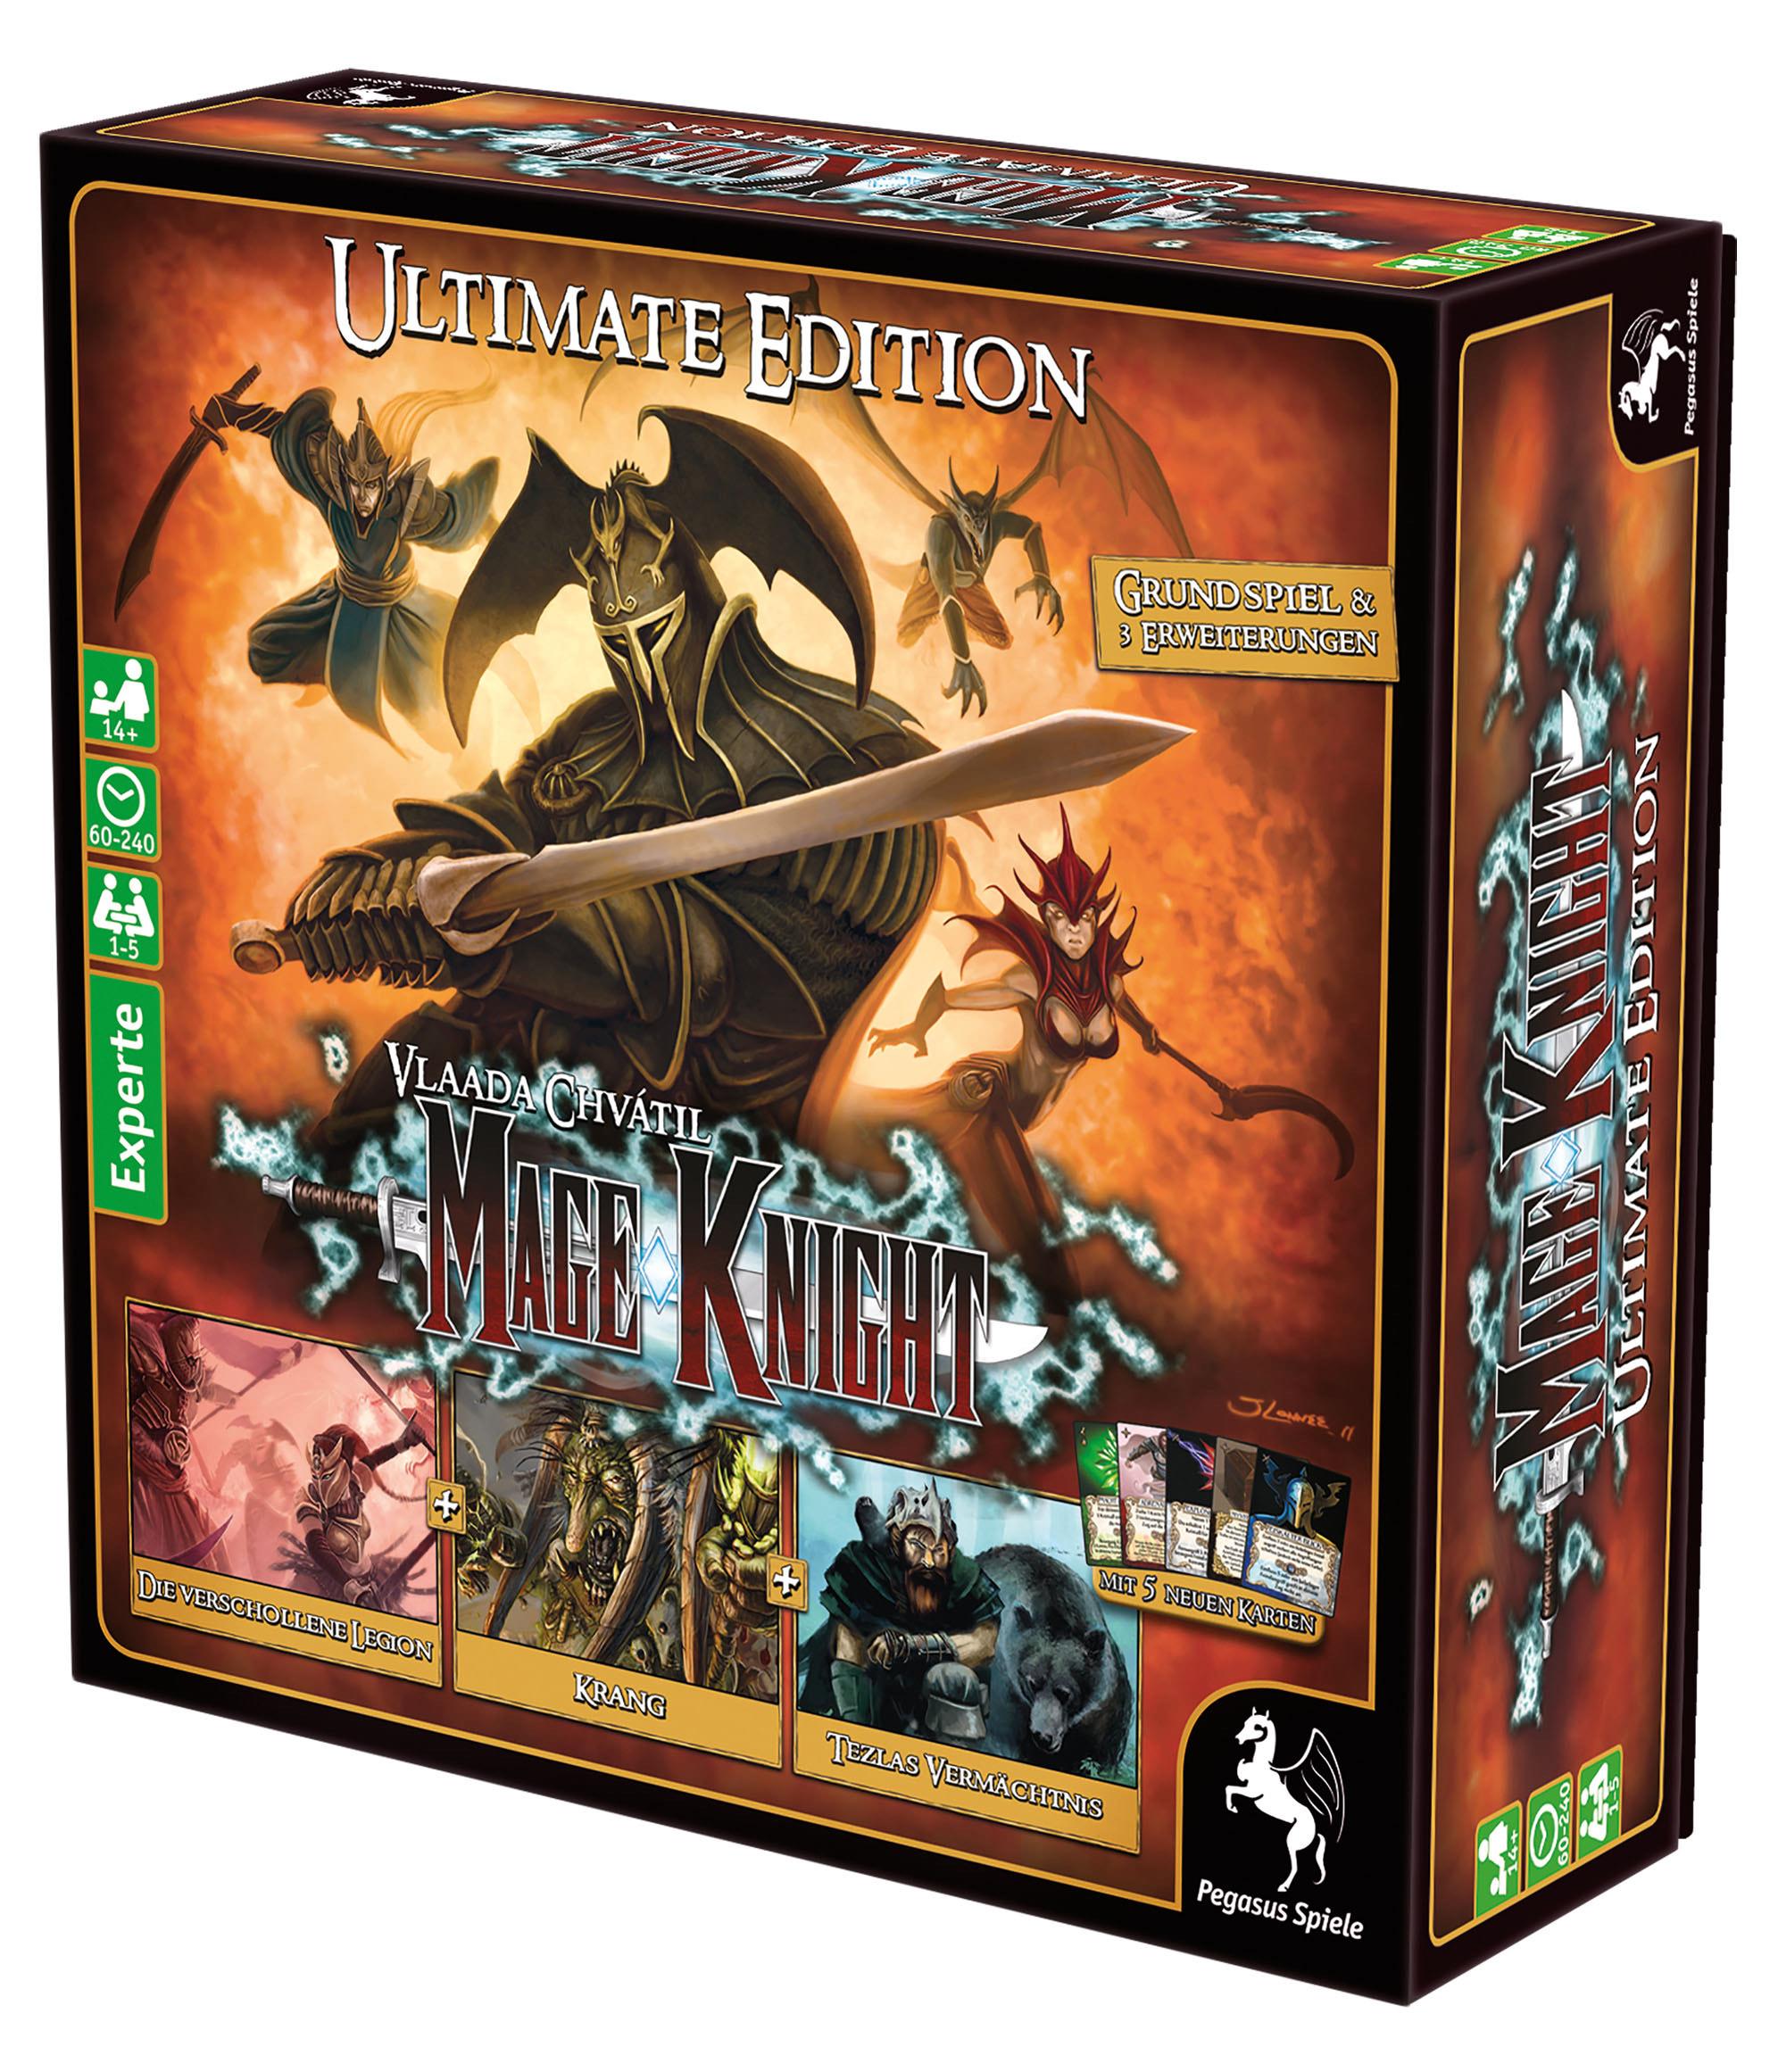 [Corporate Benefits] Mage Knight Ultimate Edition Brettspiel Bestpreis